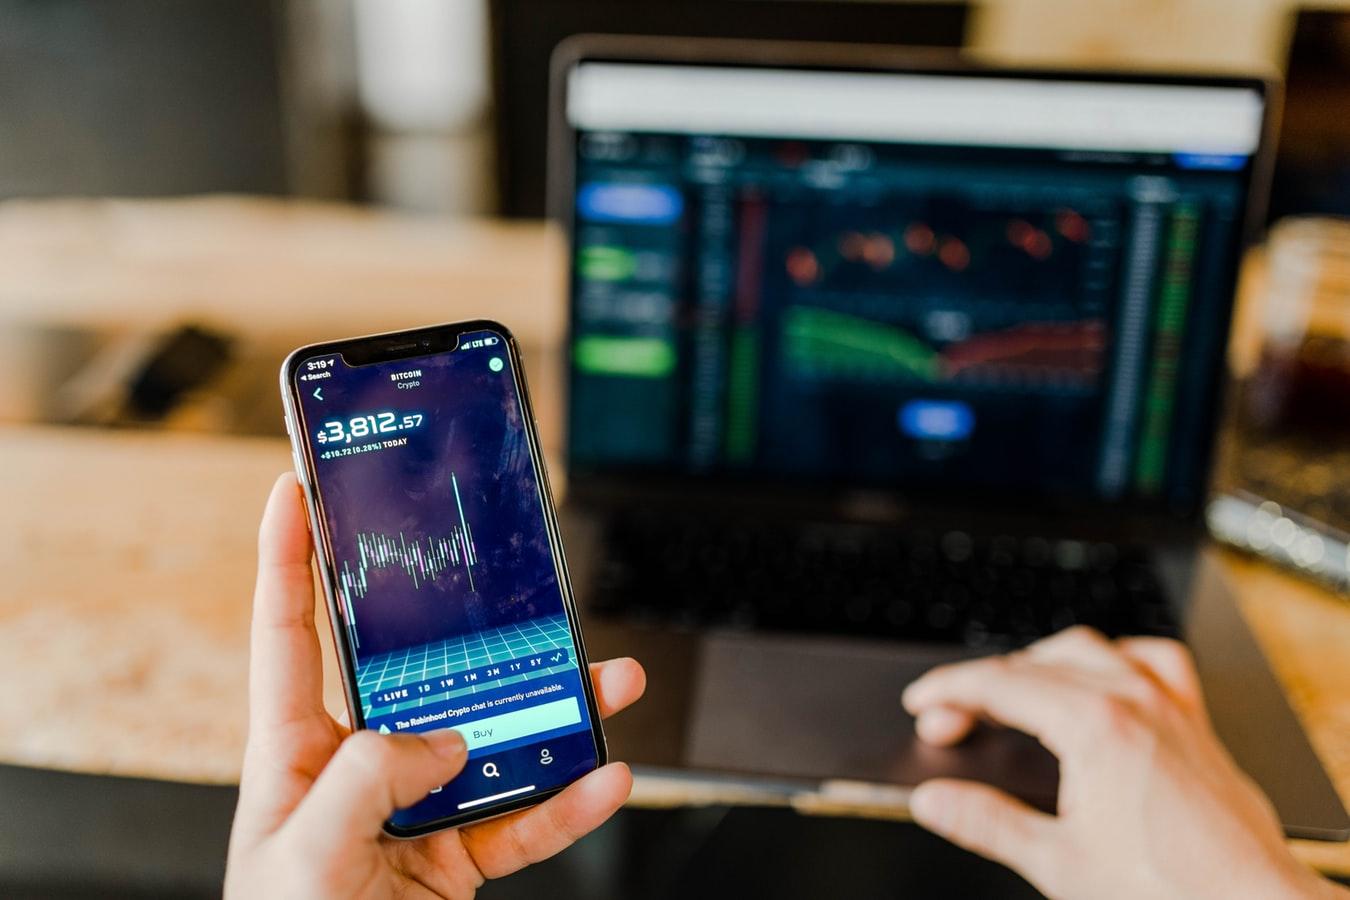 Saham BUMI Rebound, Investor Asing Ramaikan Pembelian